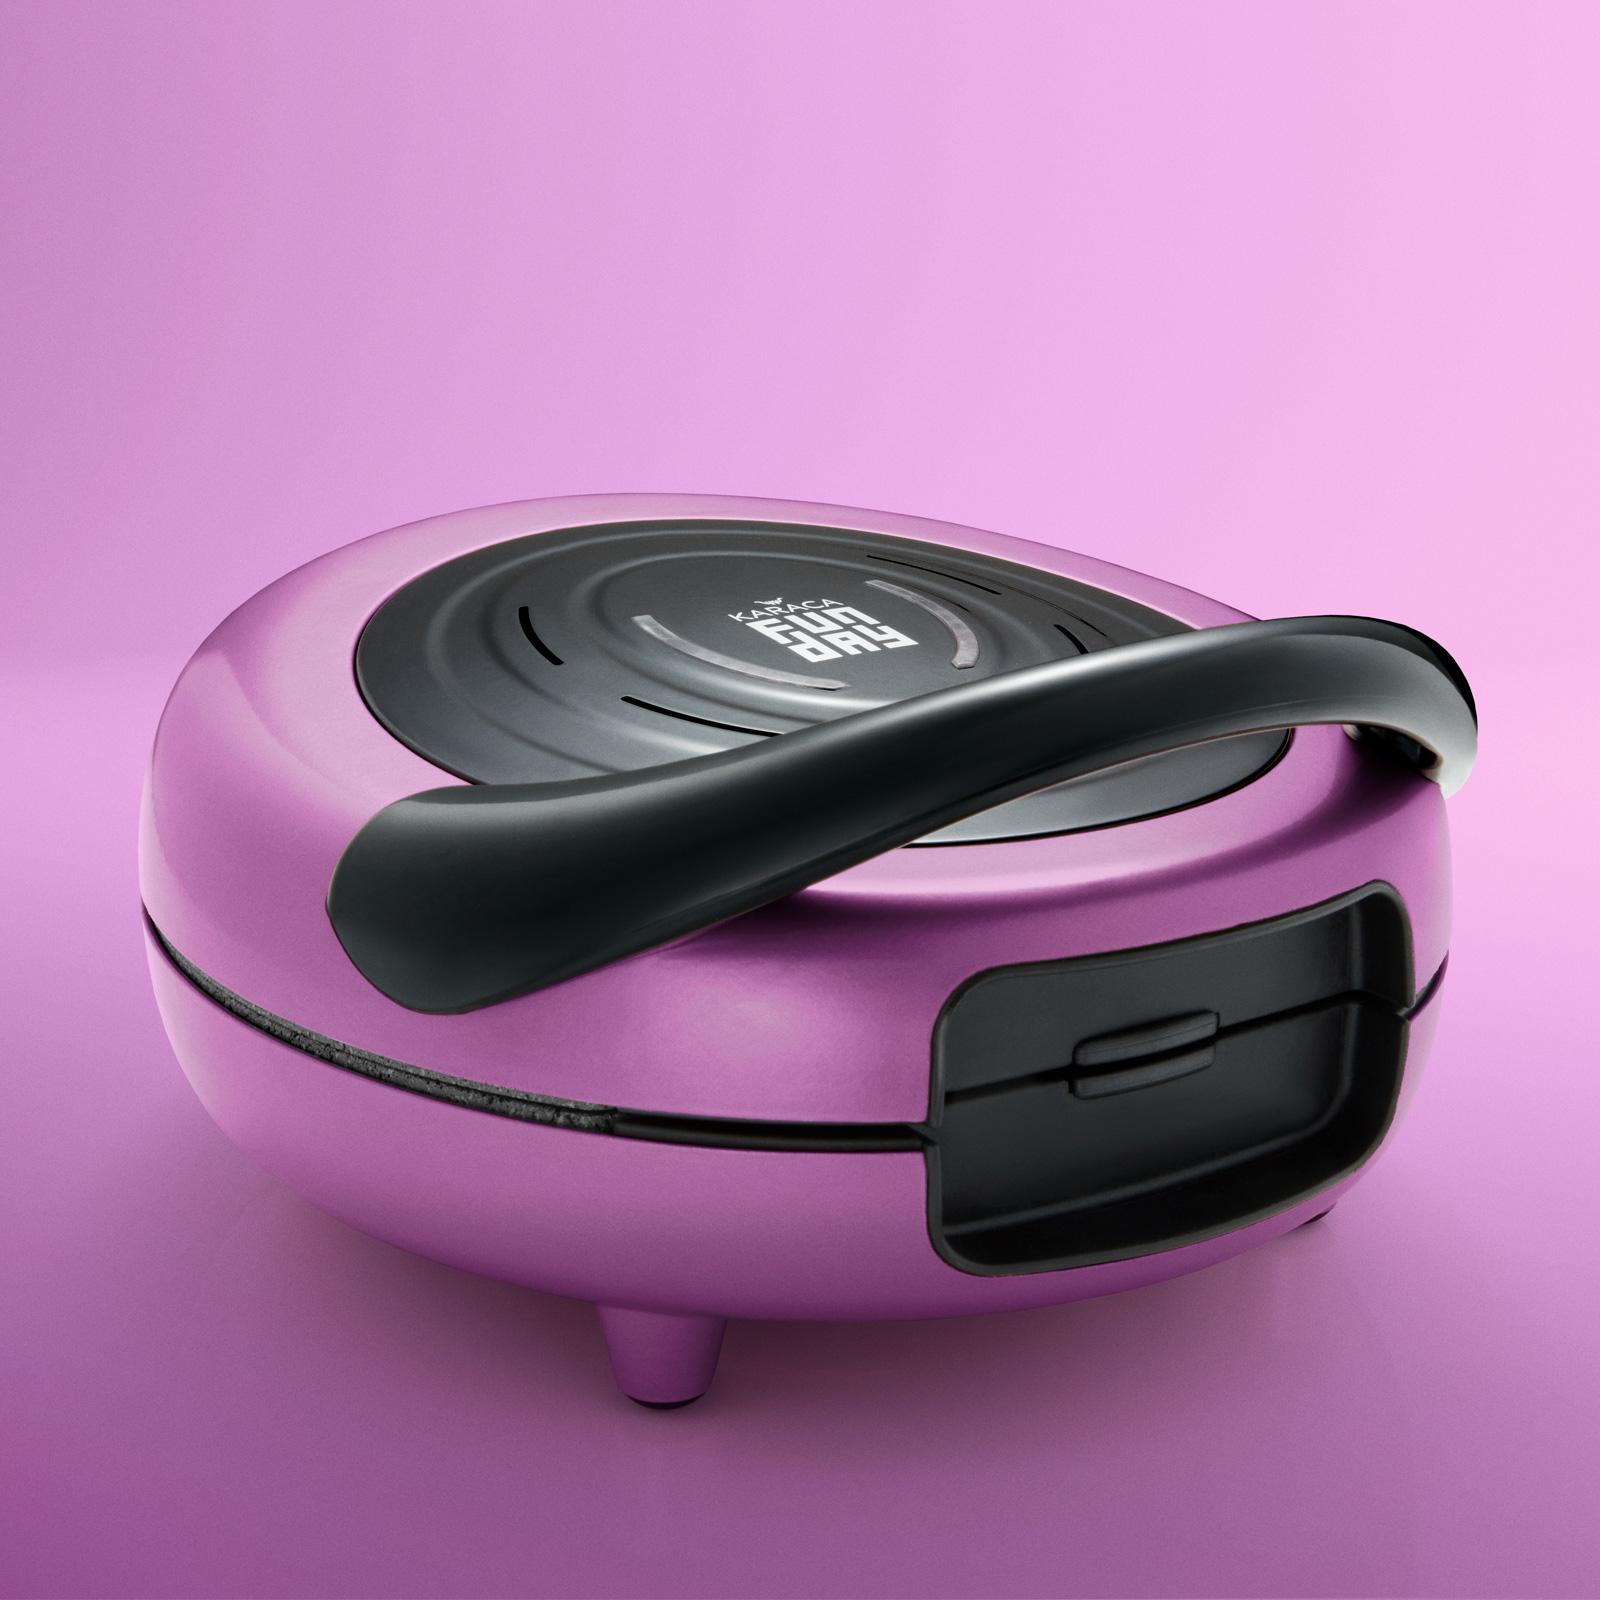 lezzetli-waffle-lar-hazirlayabileceginiz-en-iyi-5-waffle-makinesi-1